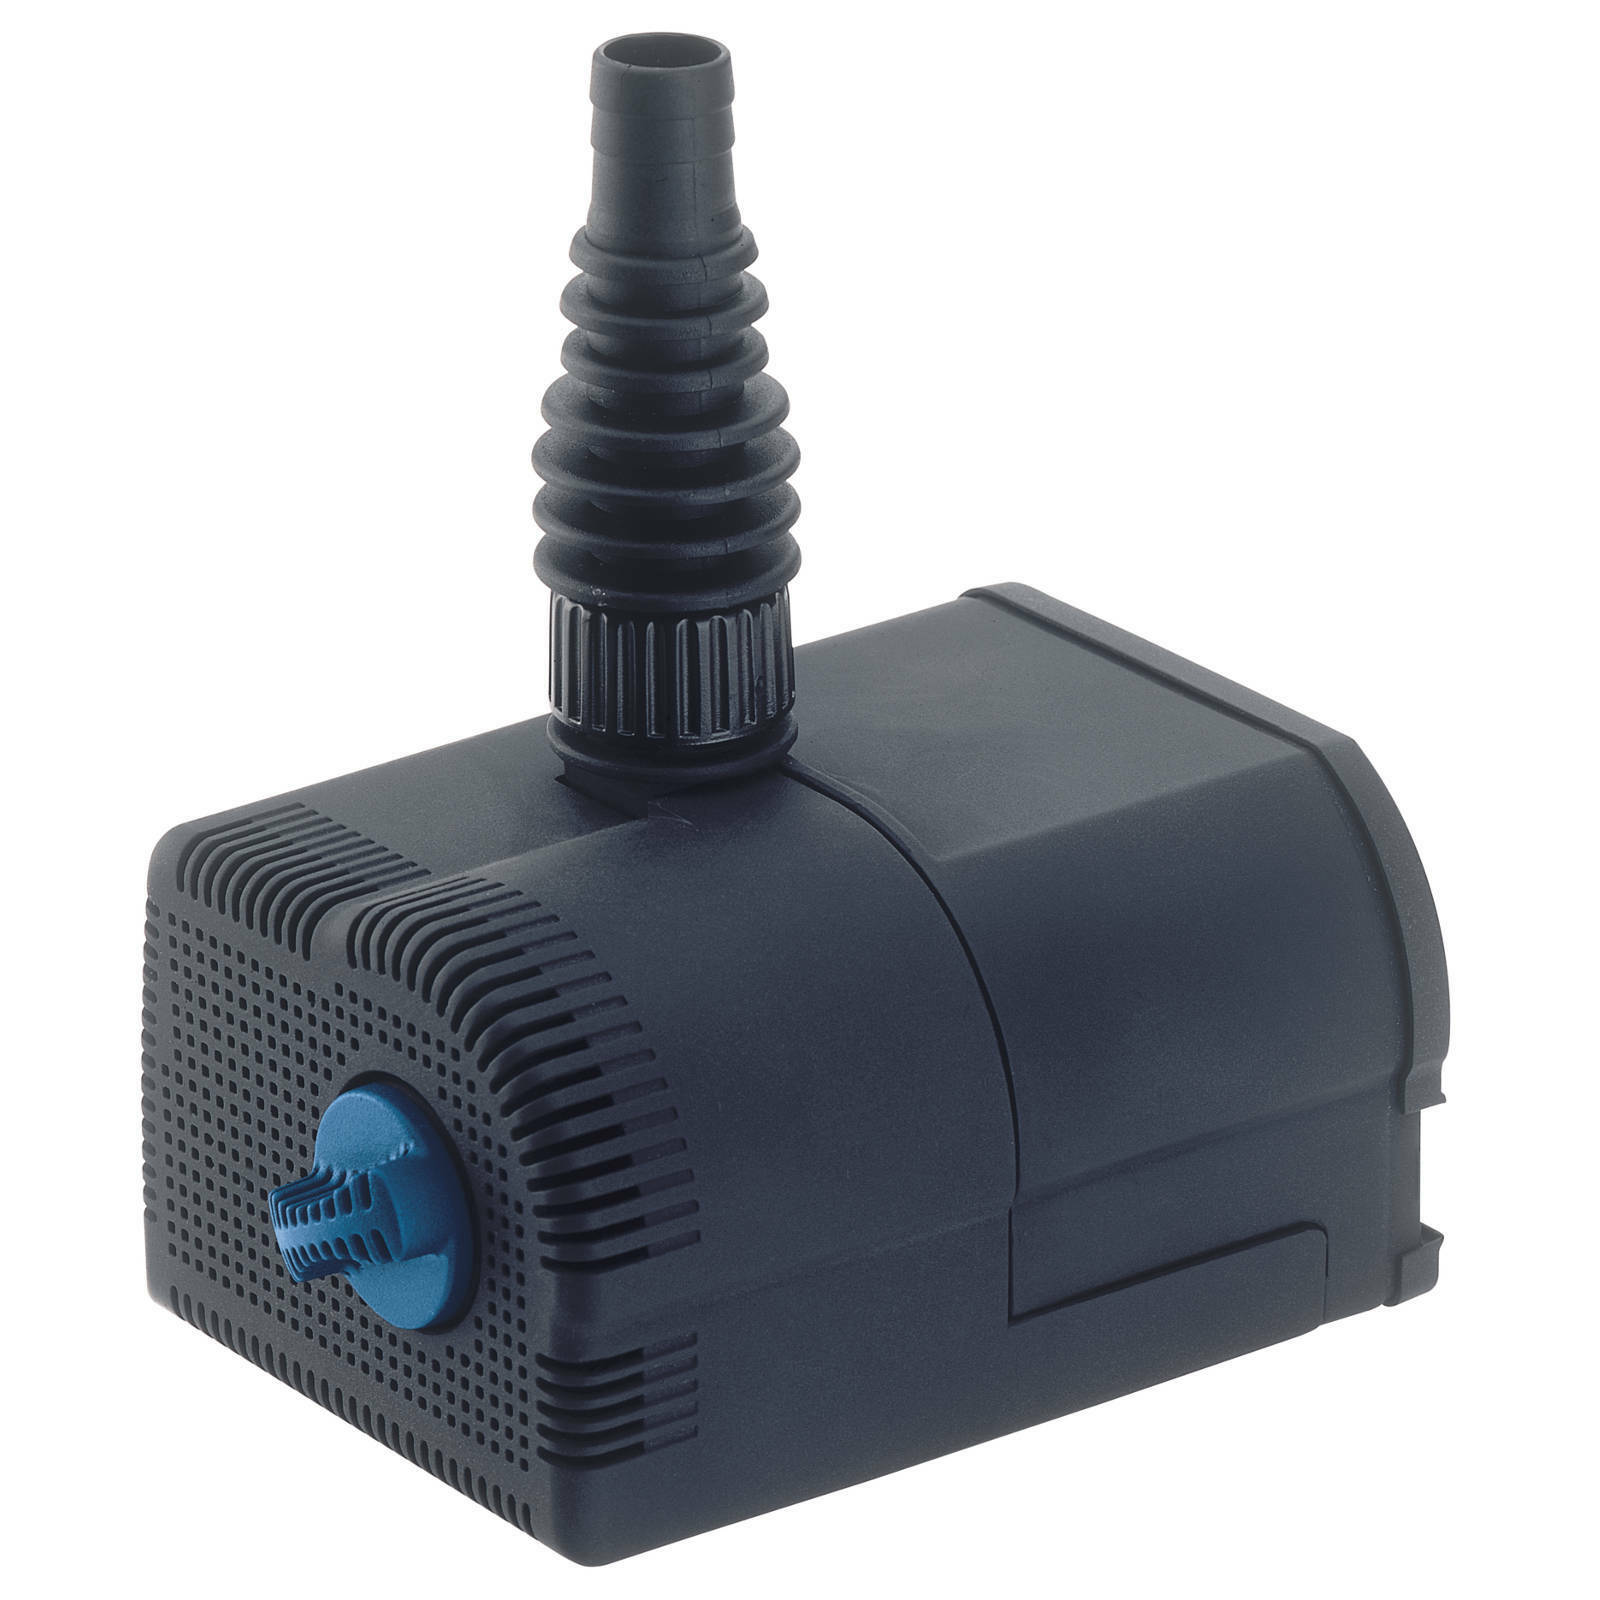 Oasi Aquarius Universal 600 acqua gioco POMPA 600 L H 7 W Fontana Pompa